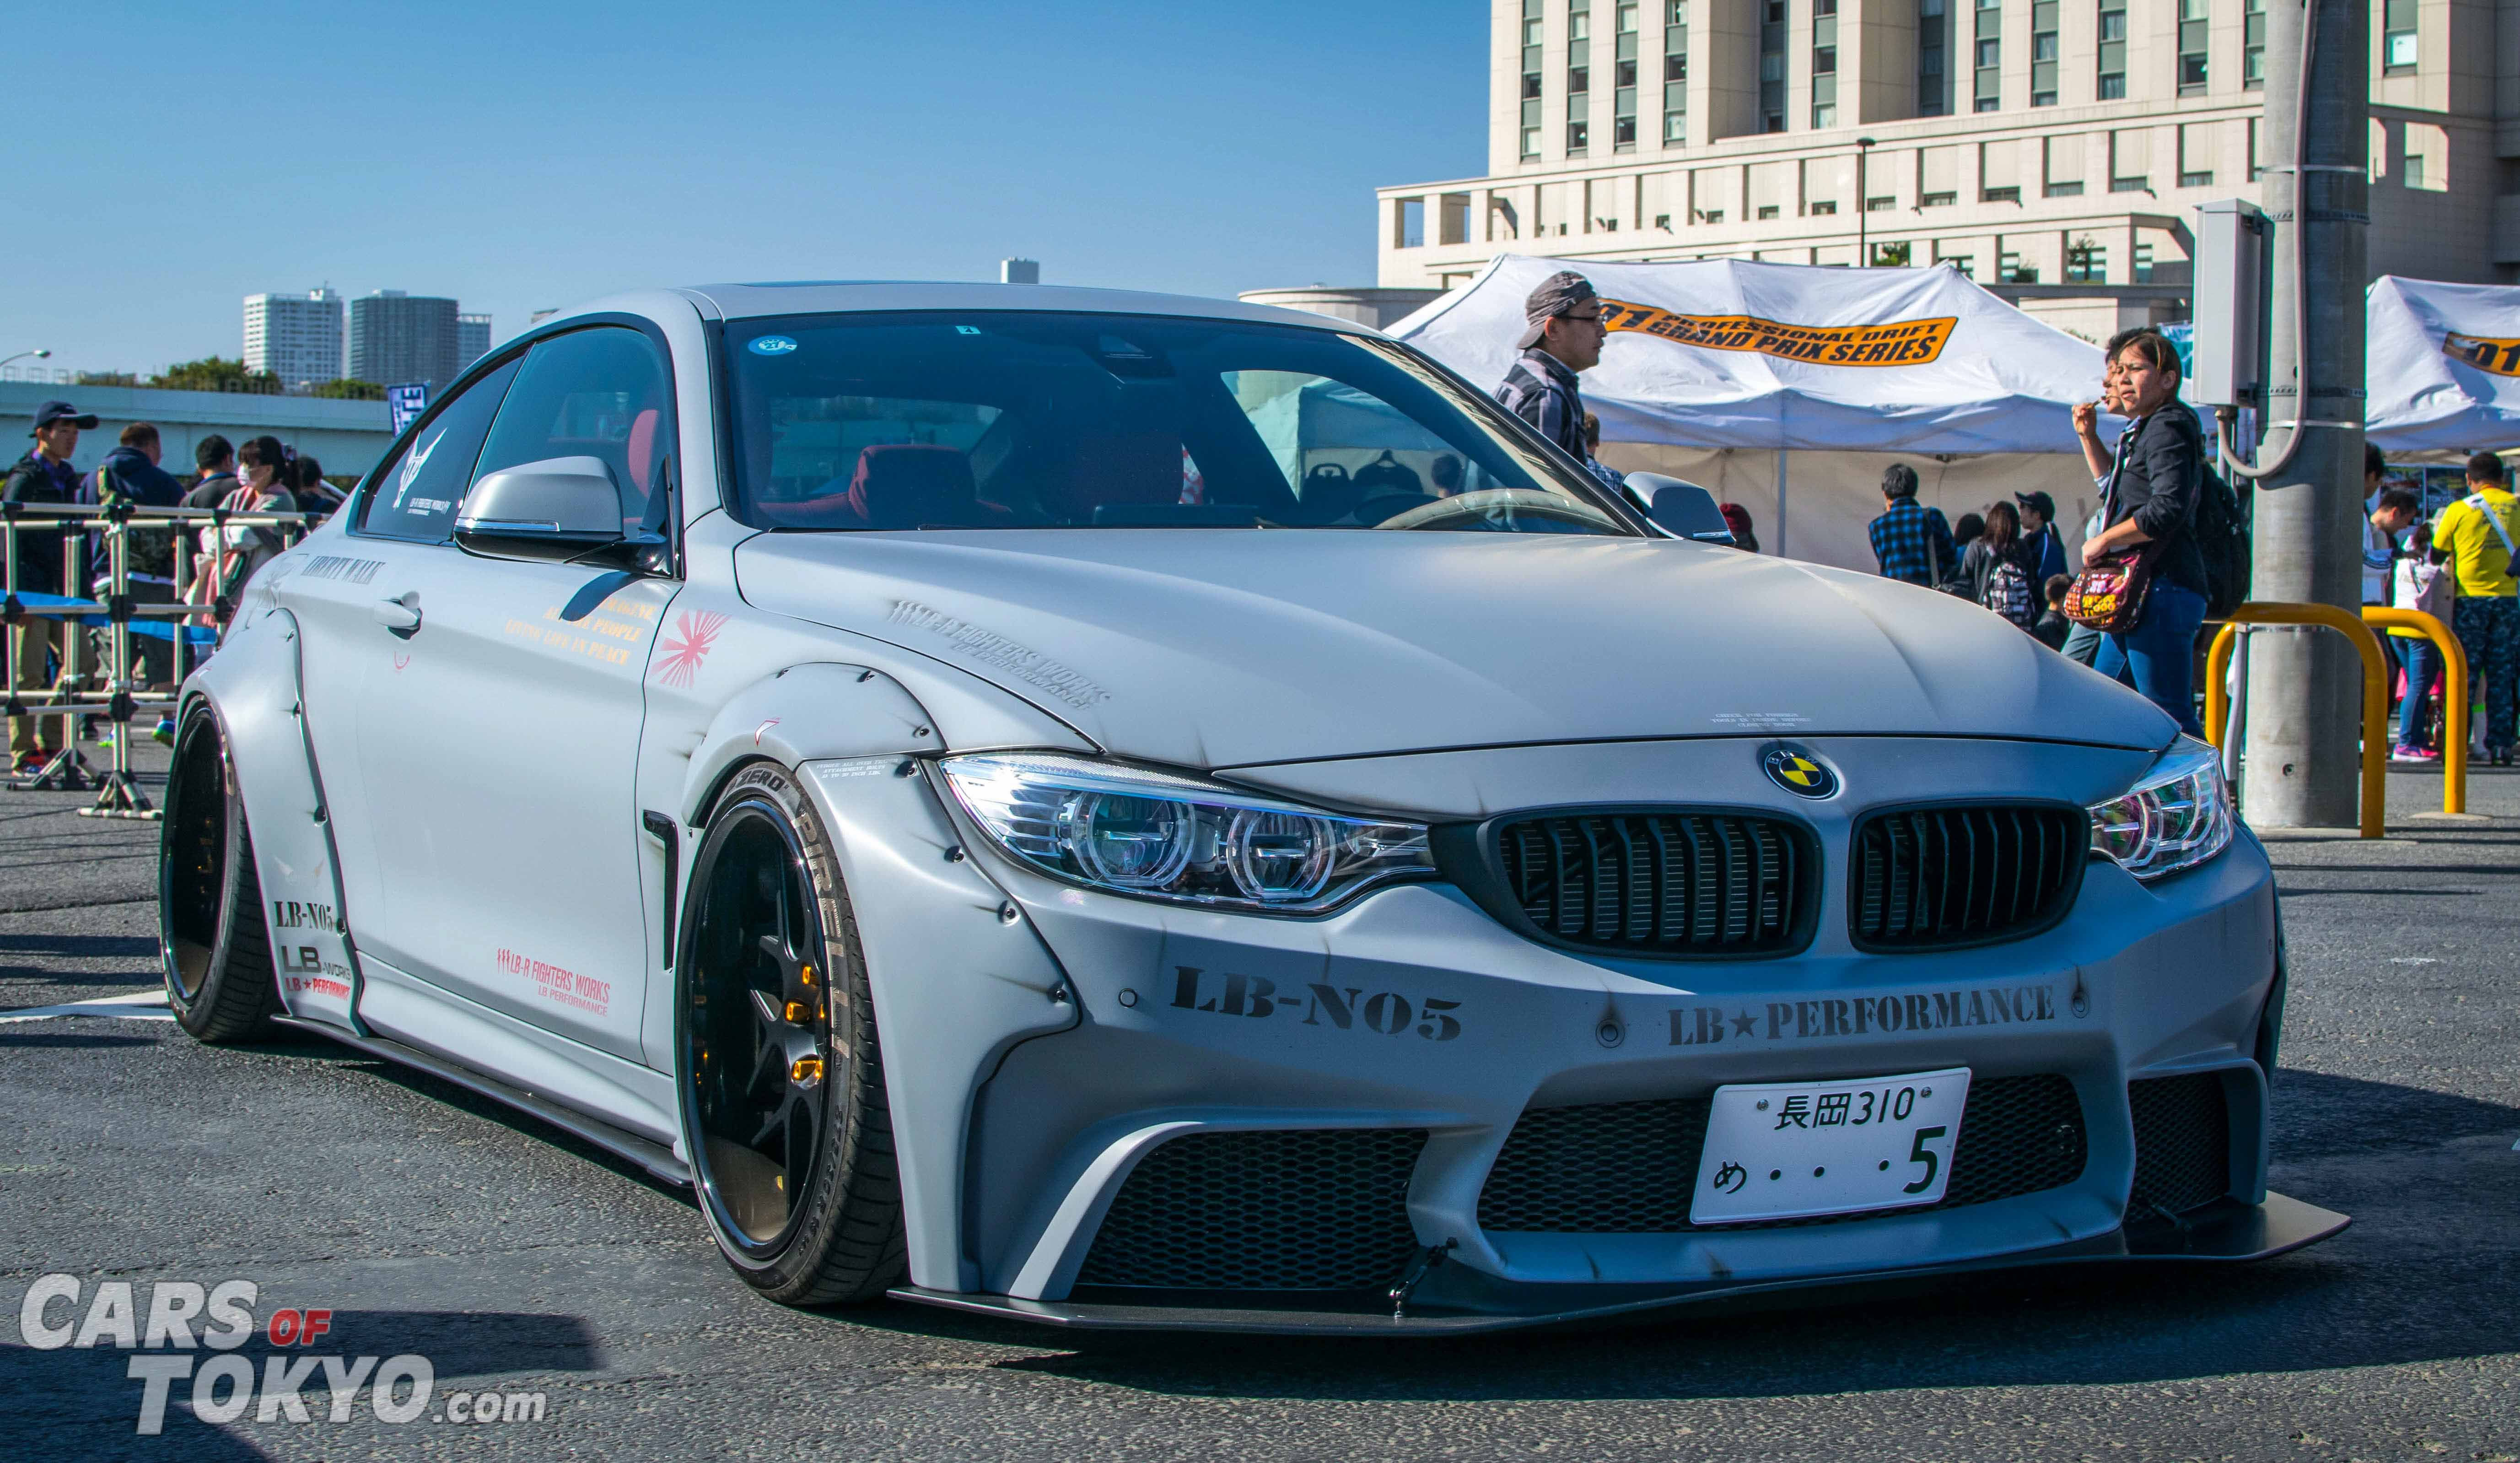 Cars of Tokyo Liberty Walk BMW 4-Series